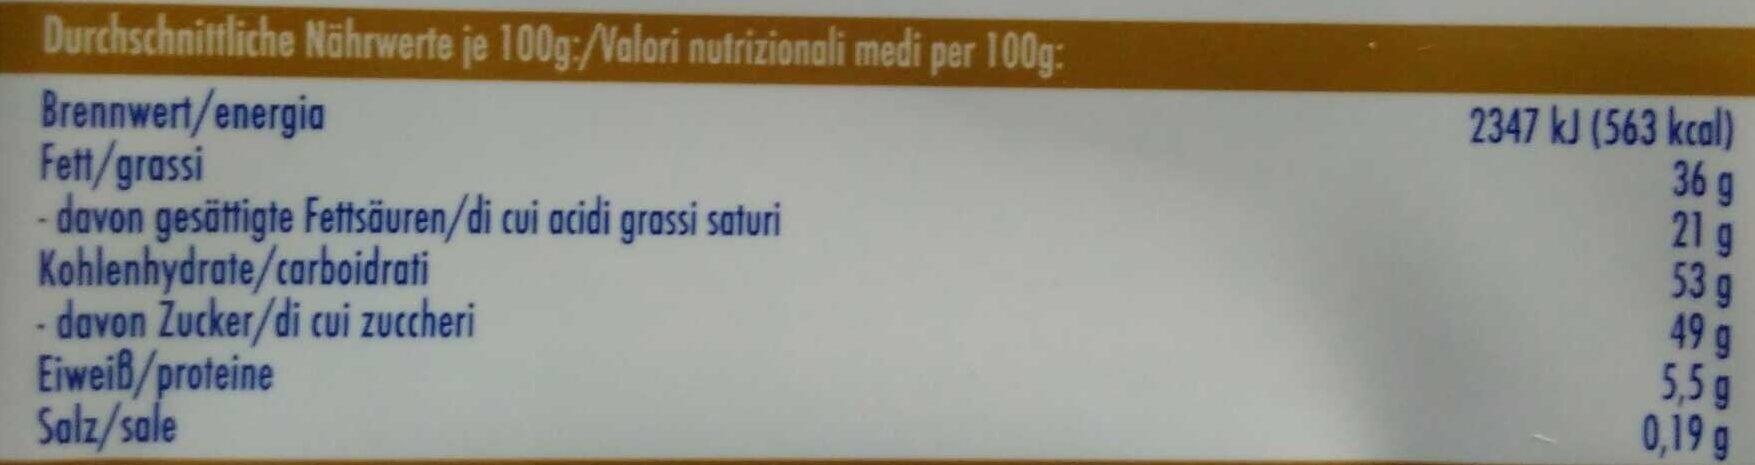 Johannisbeer Streusel - Nutrition facts